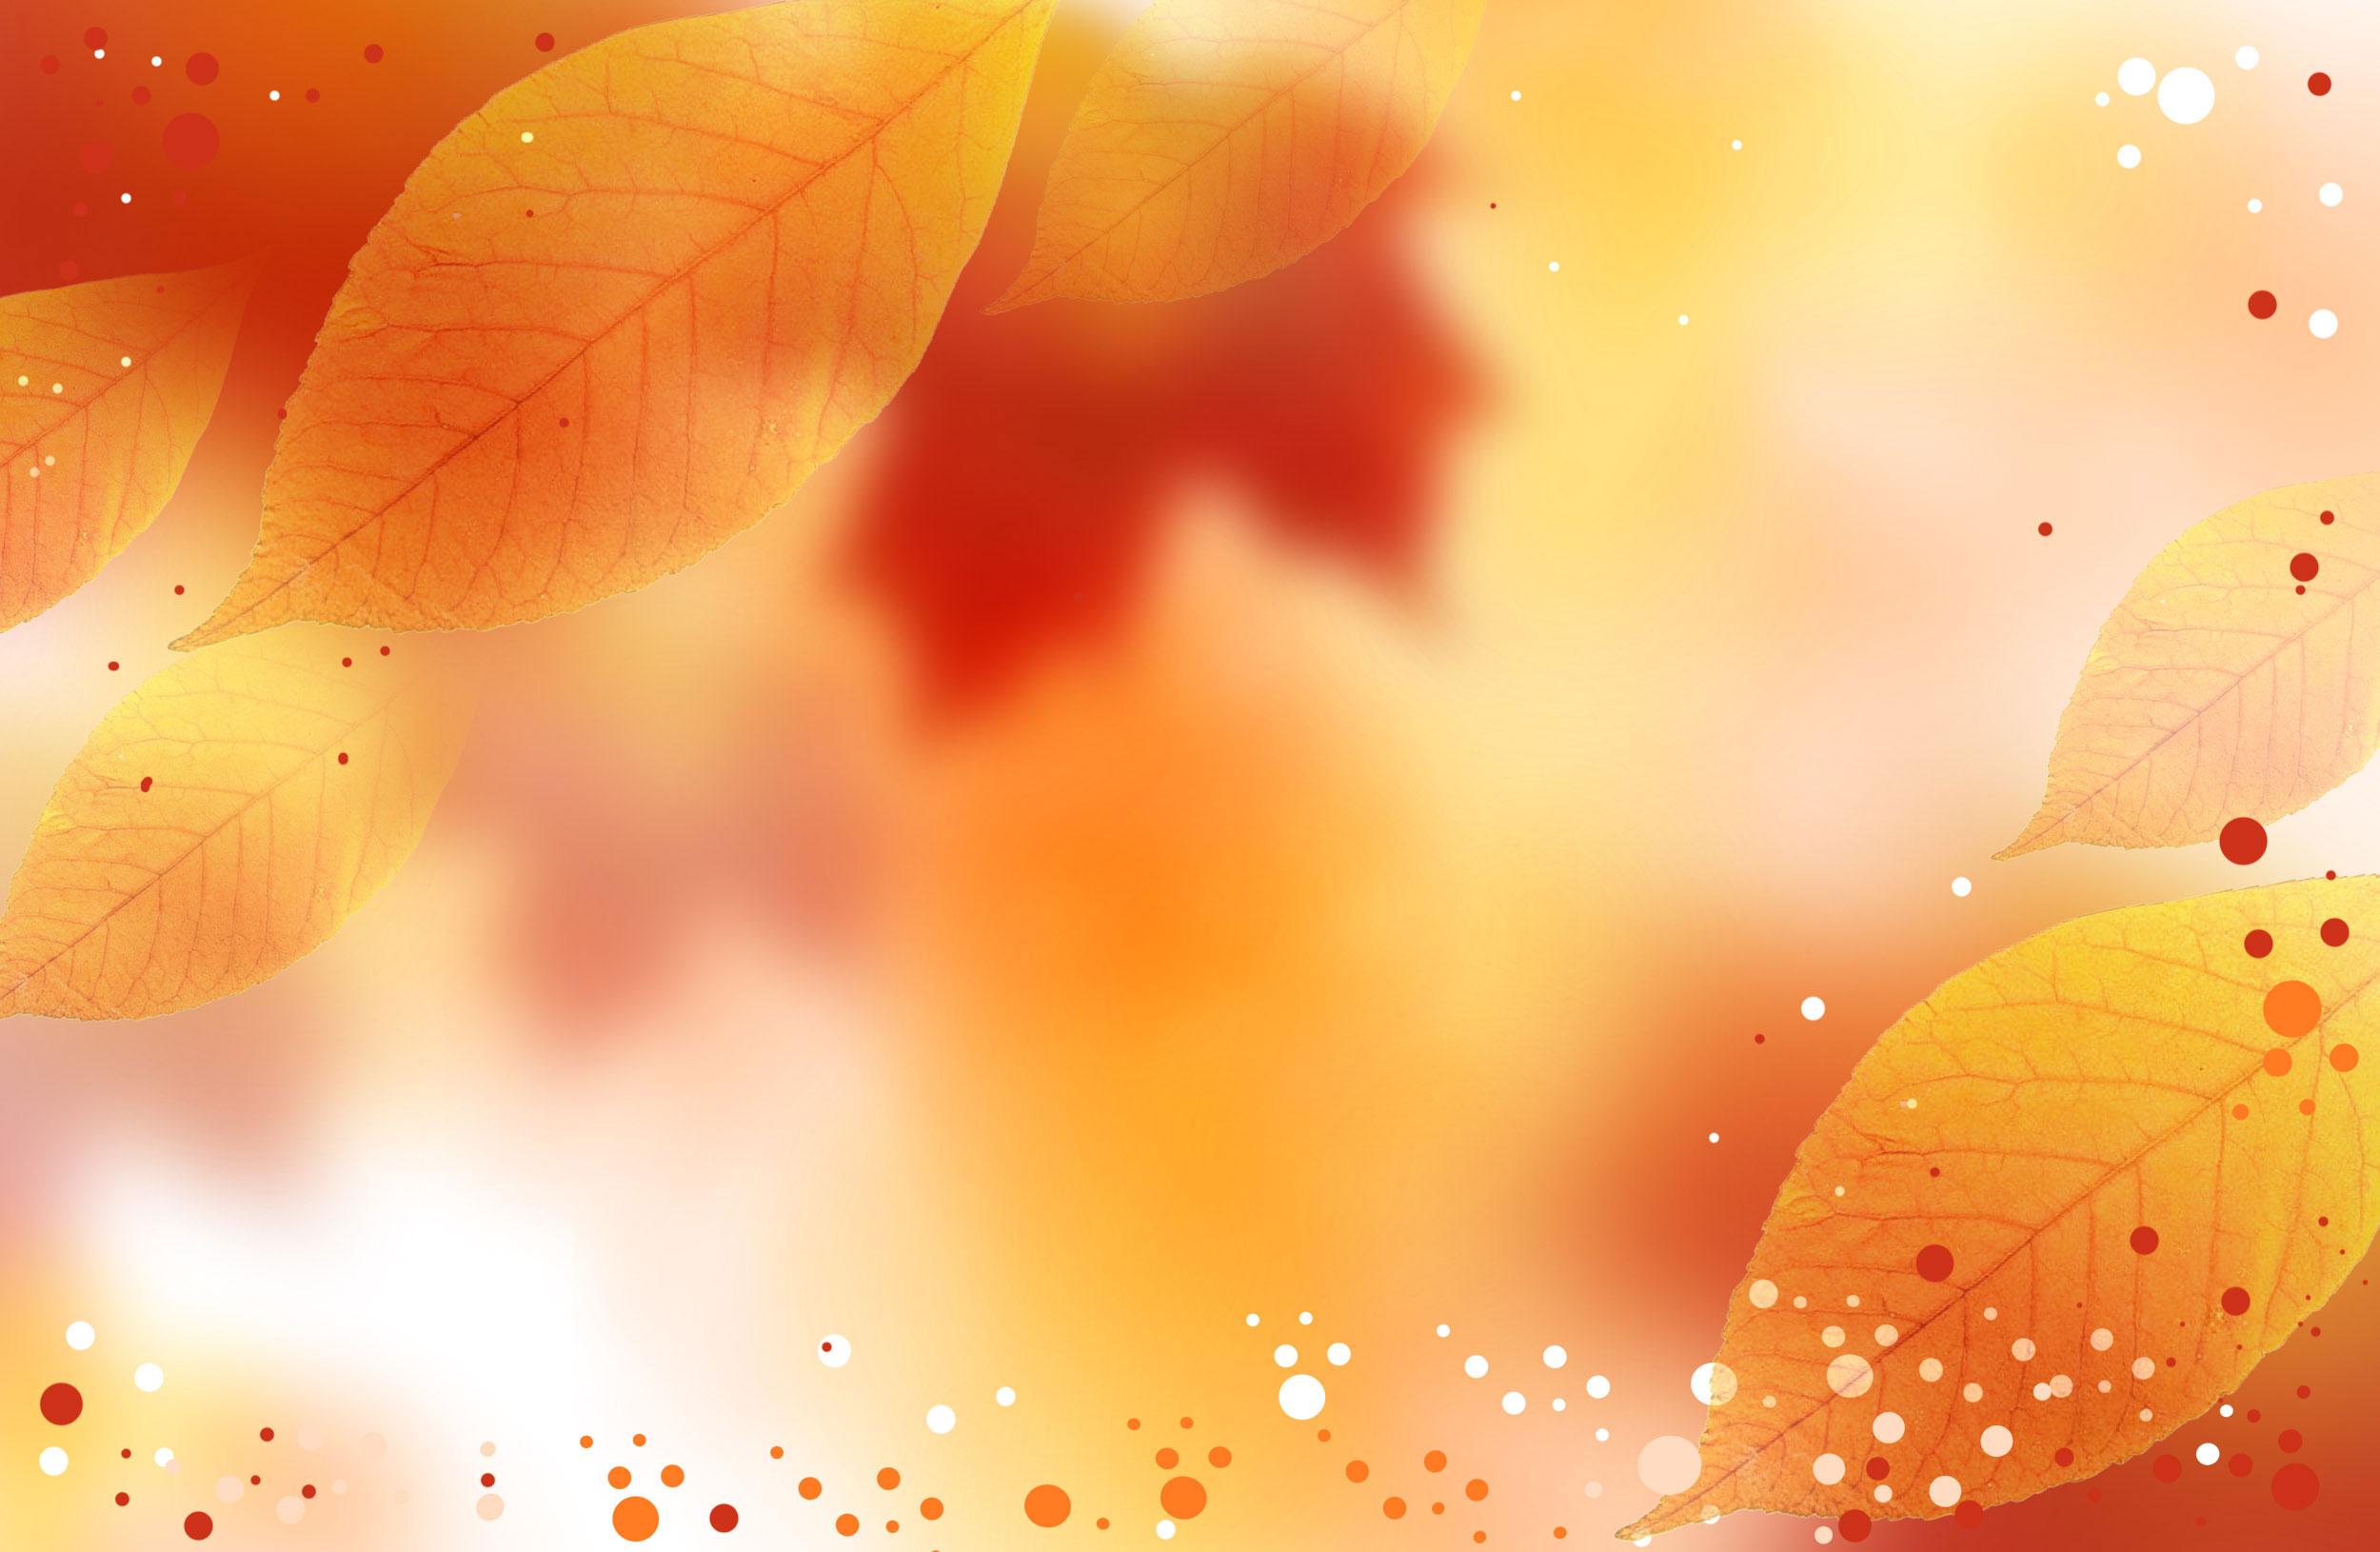 Free Autumn Desktop Backgrounds - WallpaperSafari